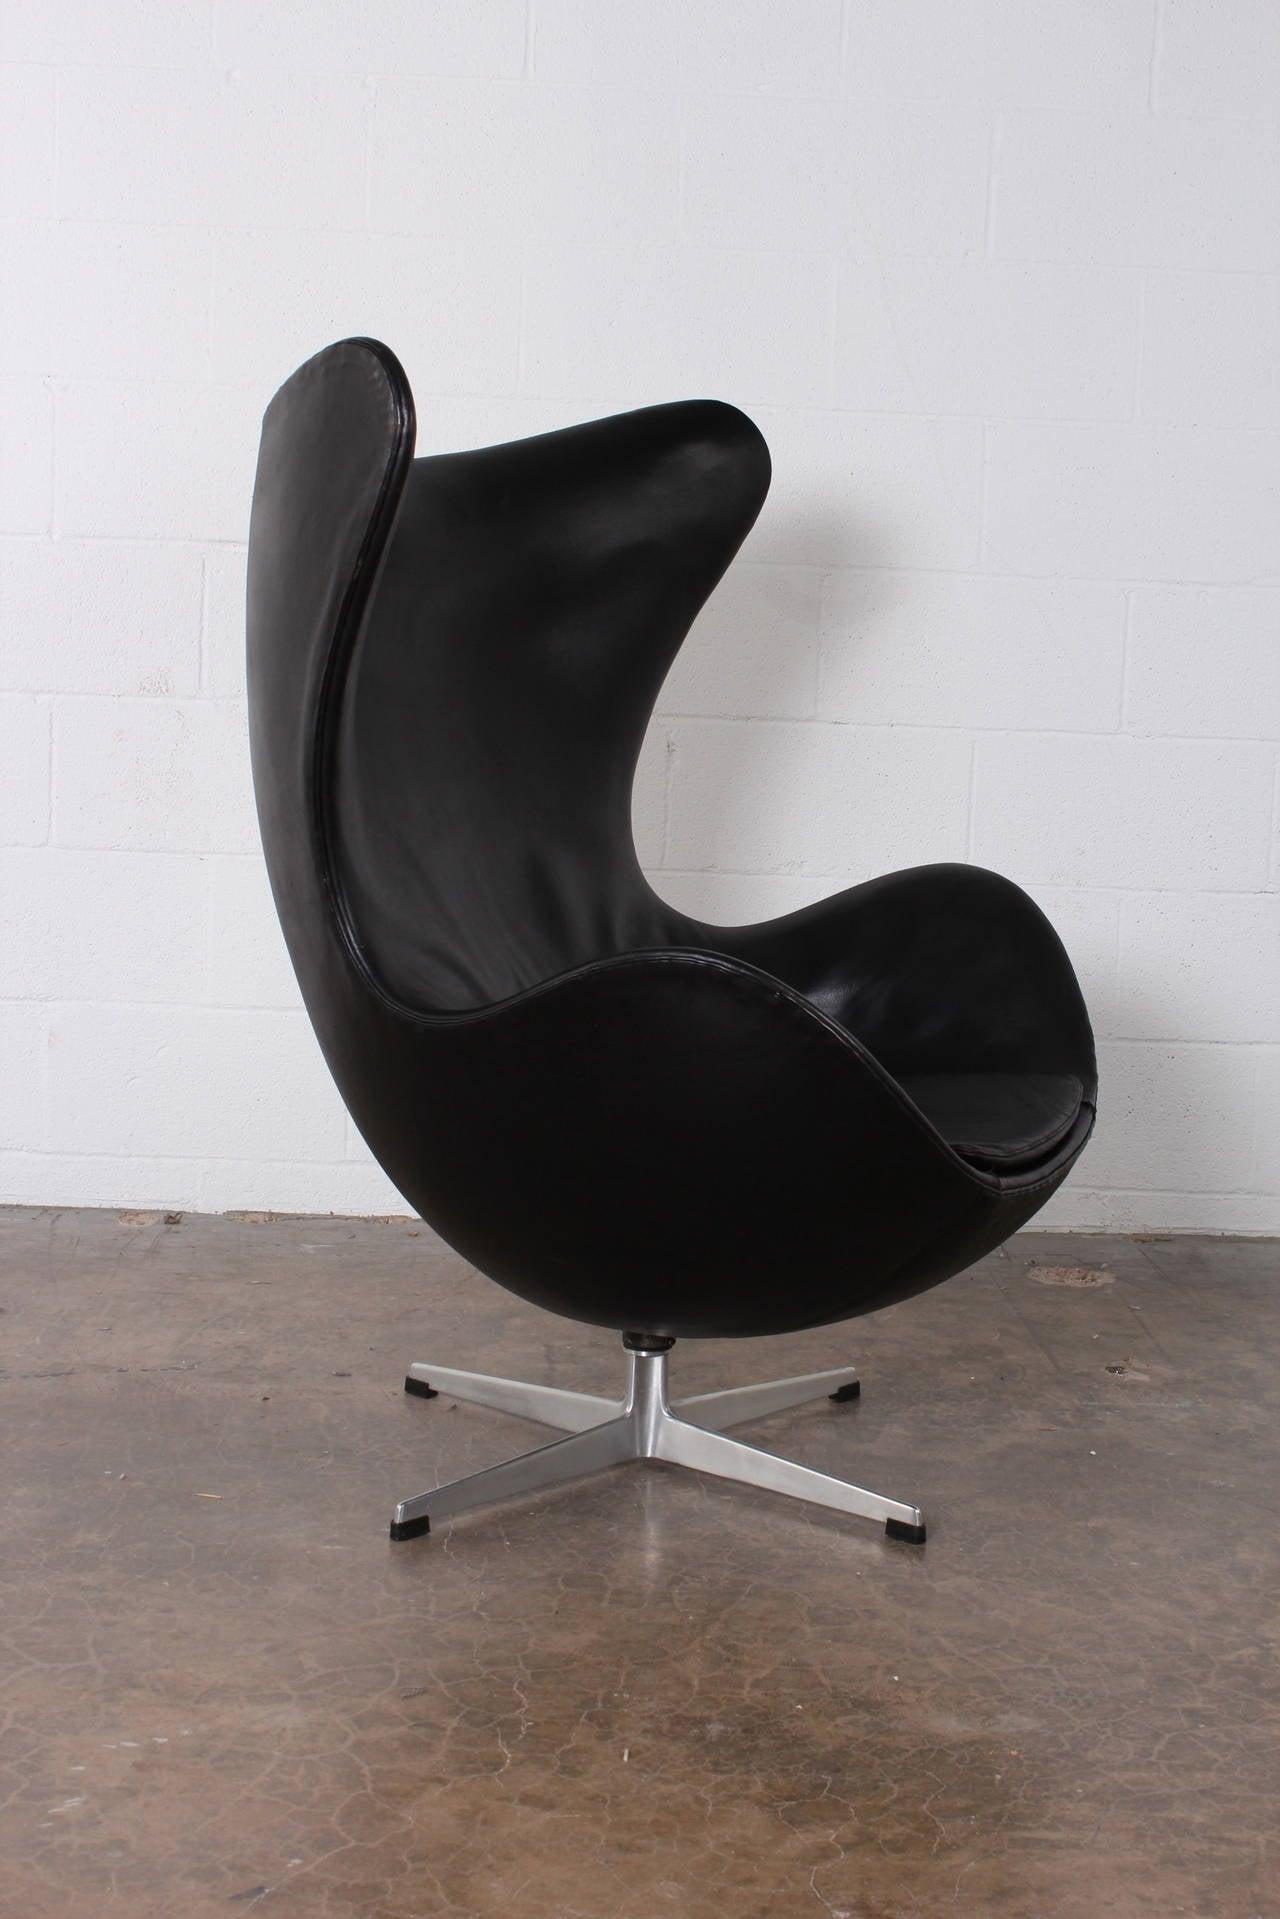 egg chair by arne jacobsen in original leather at 1stdibs. Black Bedroom Furniture Sets. Home Design Ideas